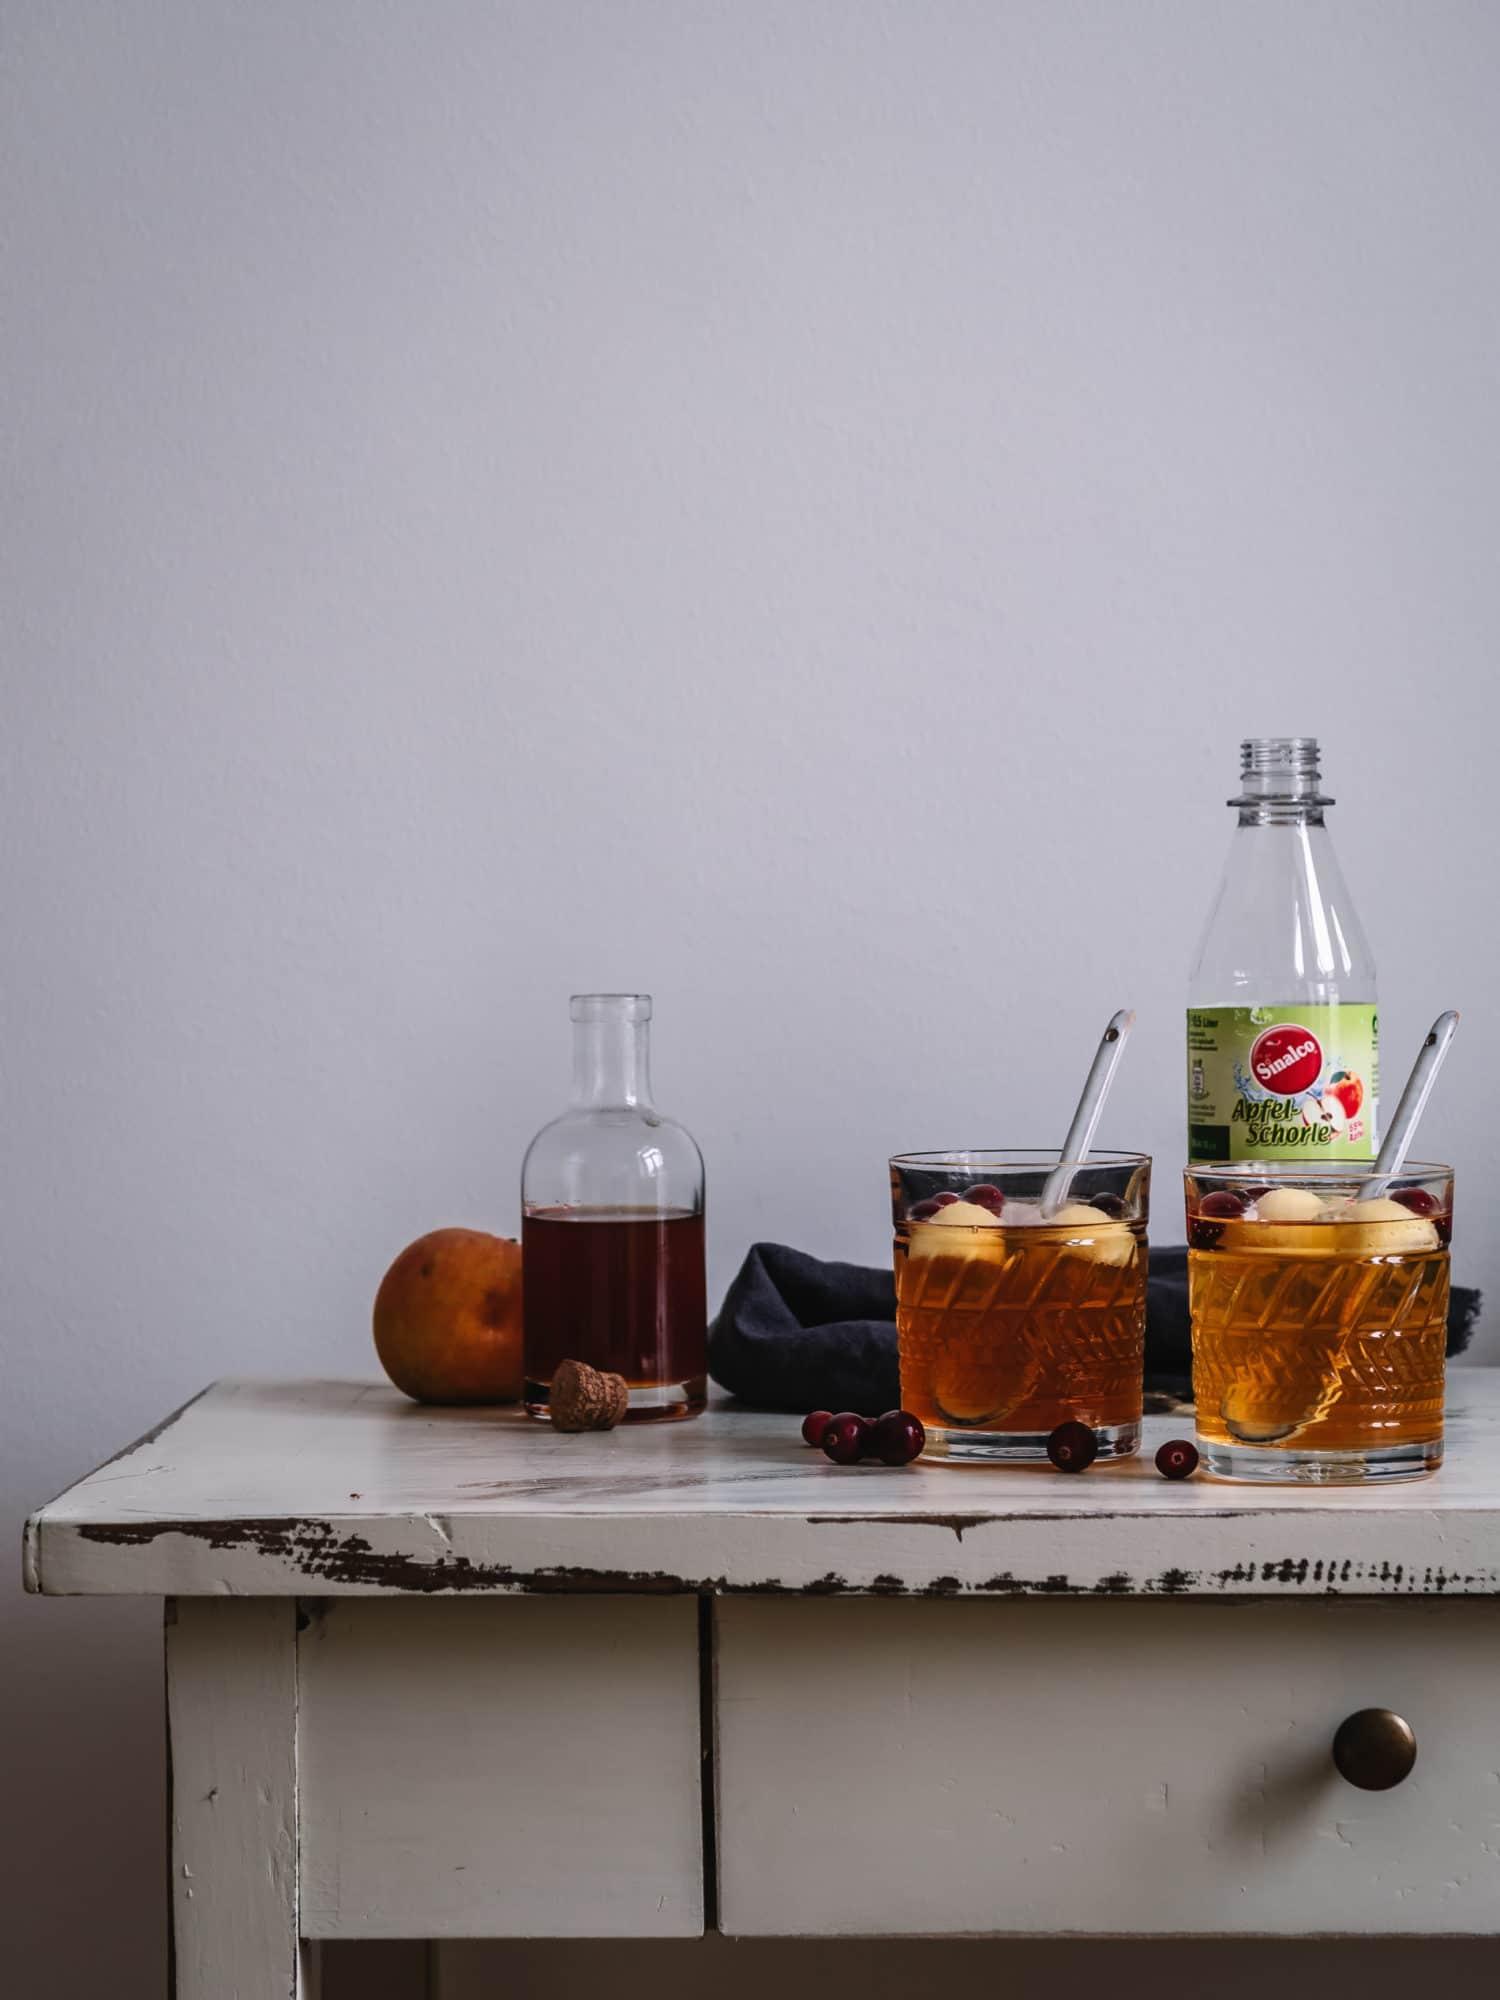 alkoholfreie bowle aus Sinalco Apfelschorle